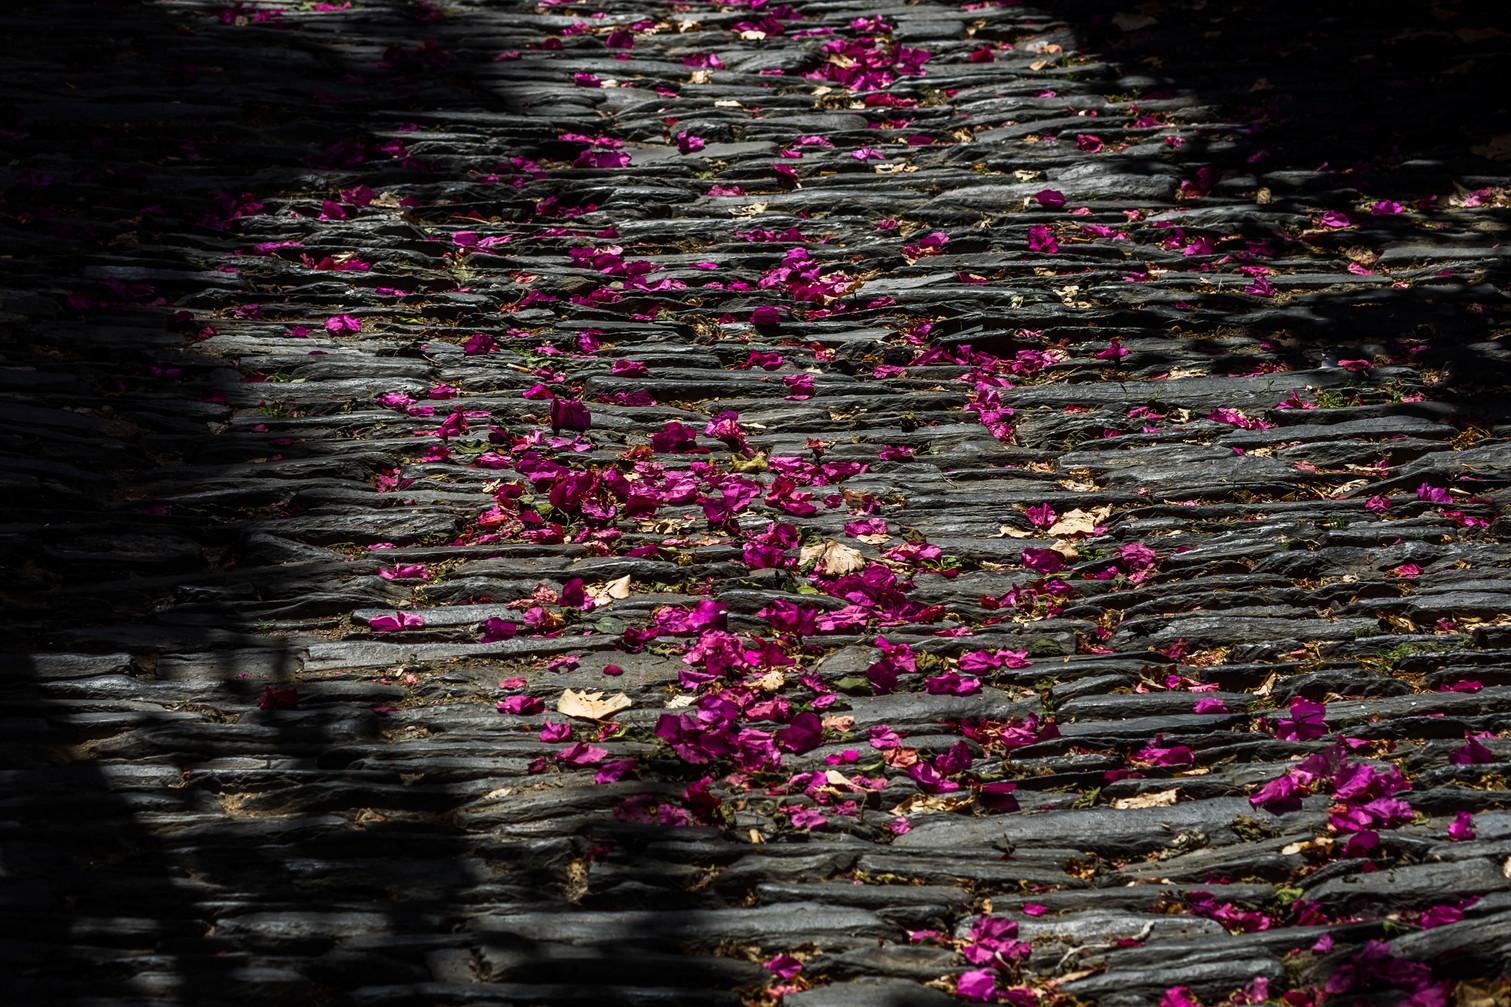 Bougainvillea leaves in a Cadaqués street - Cadaqués (Spain)